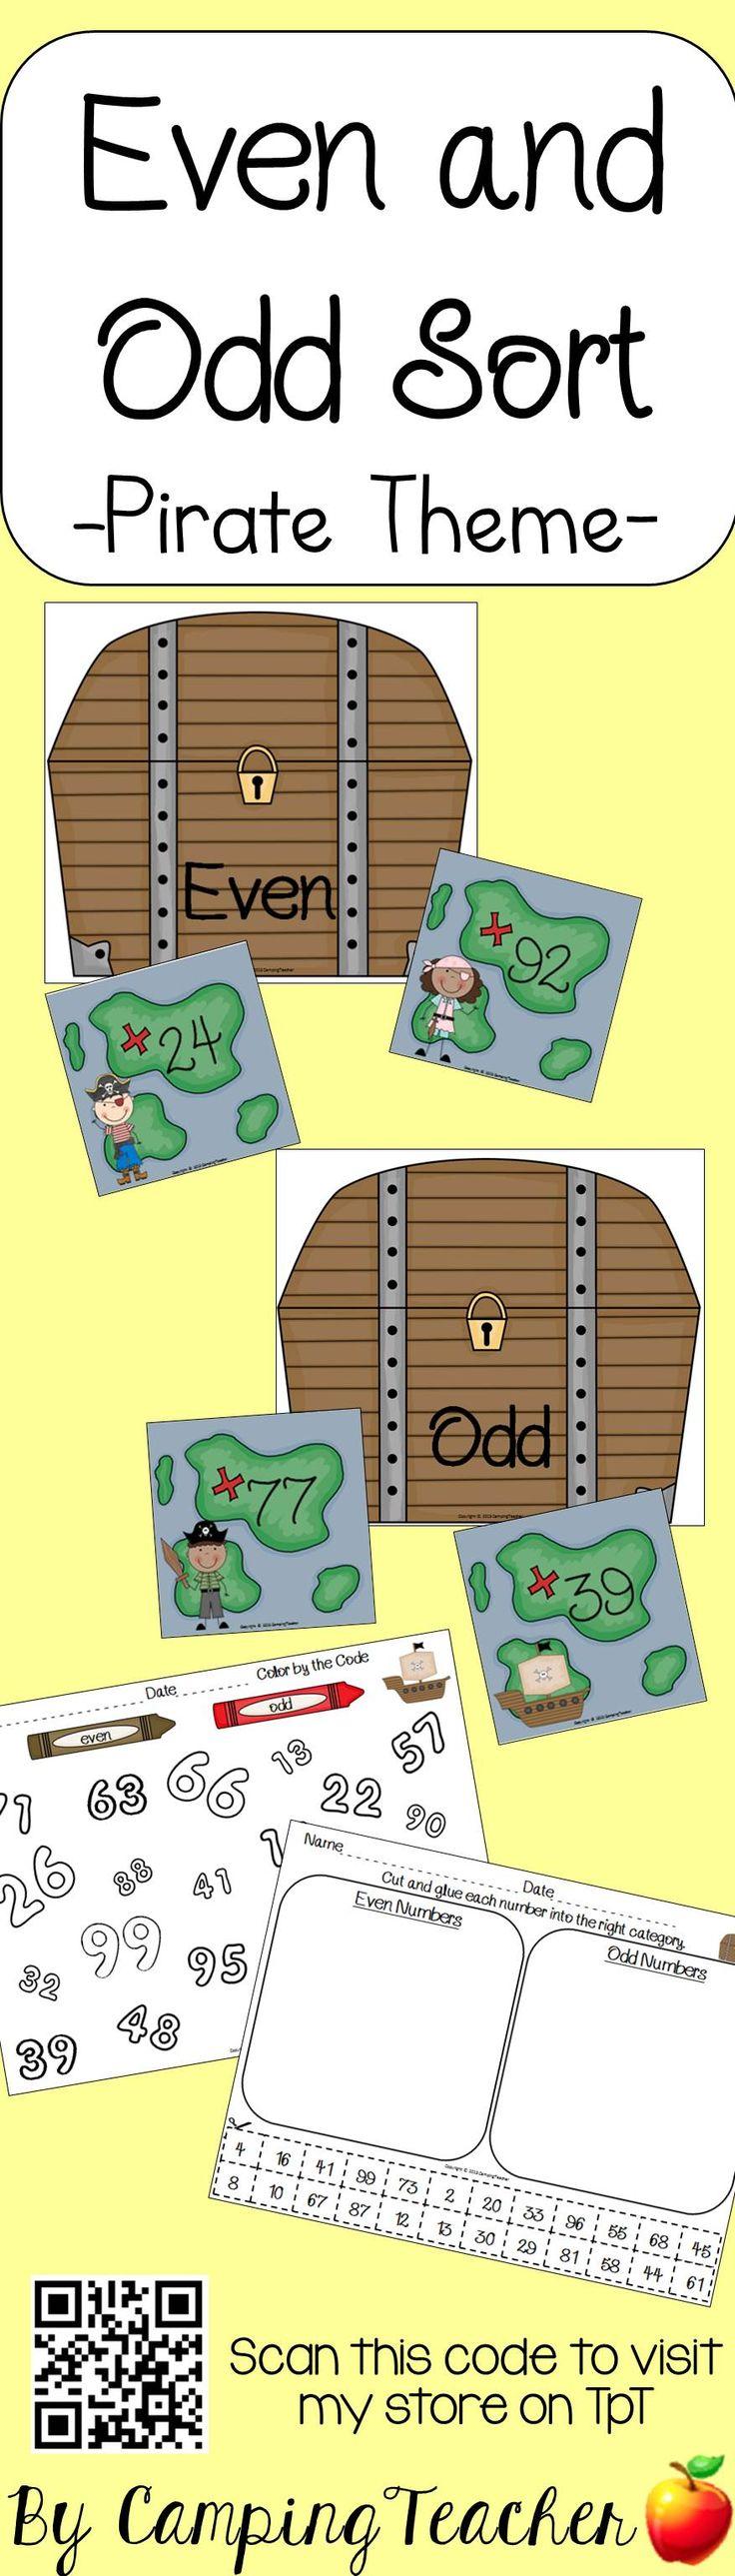 Even and Odd Sort - Pirate Theme!